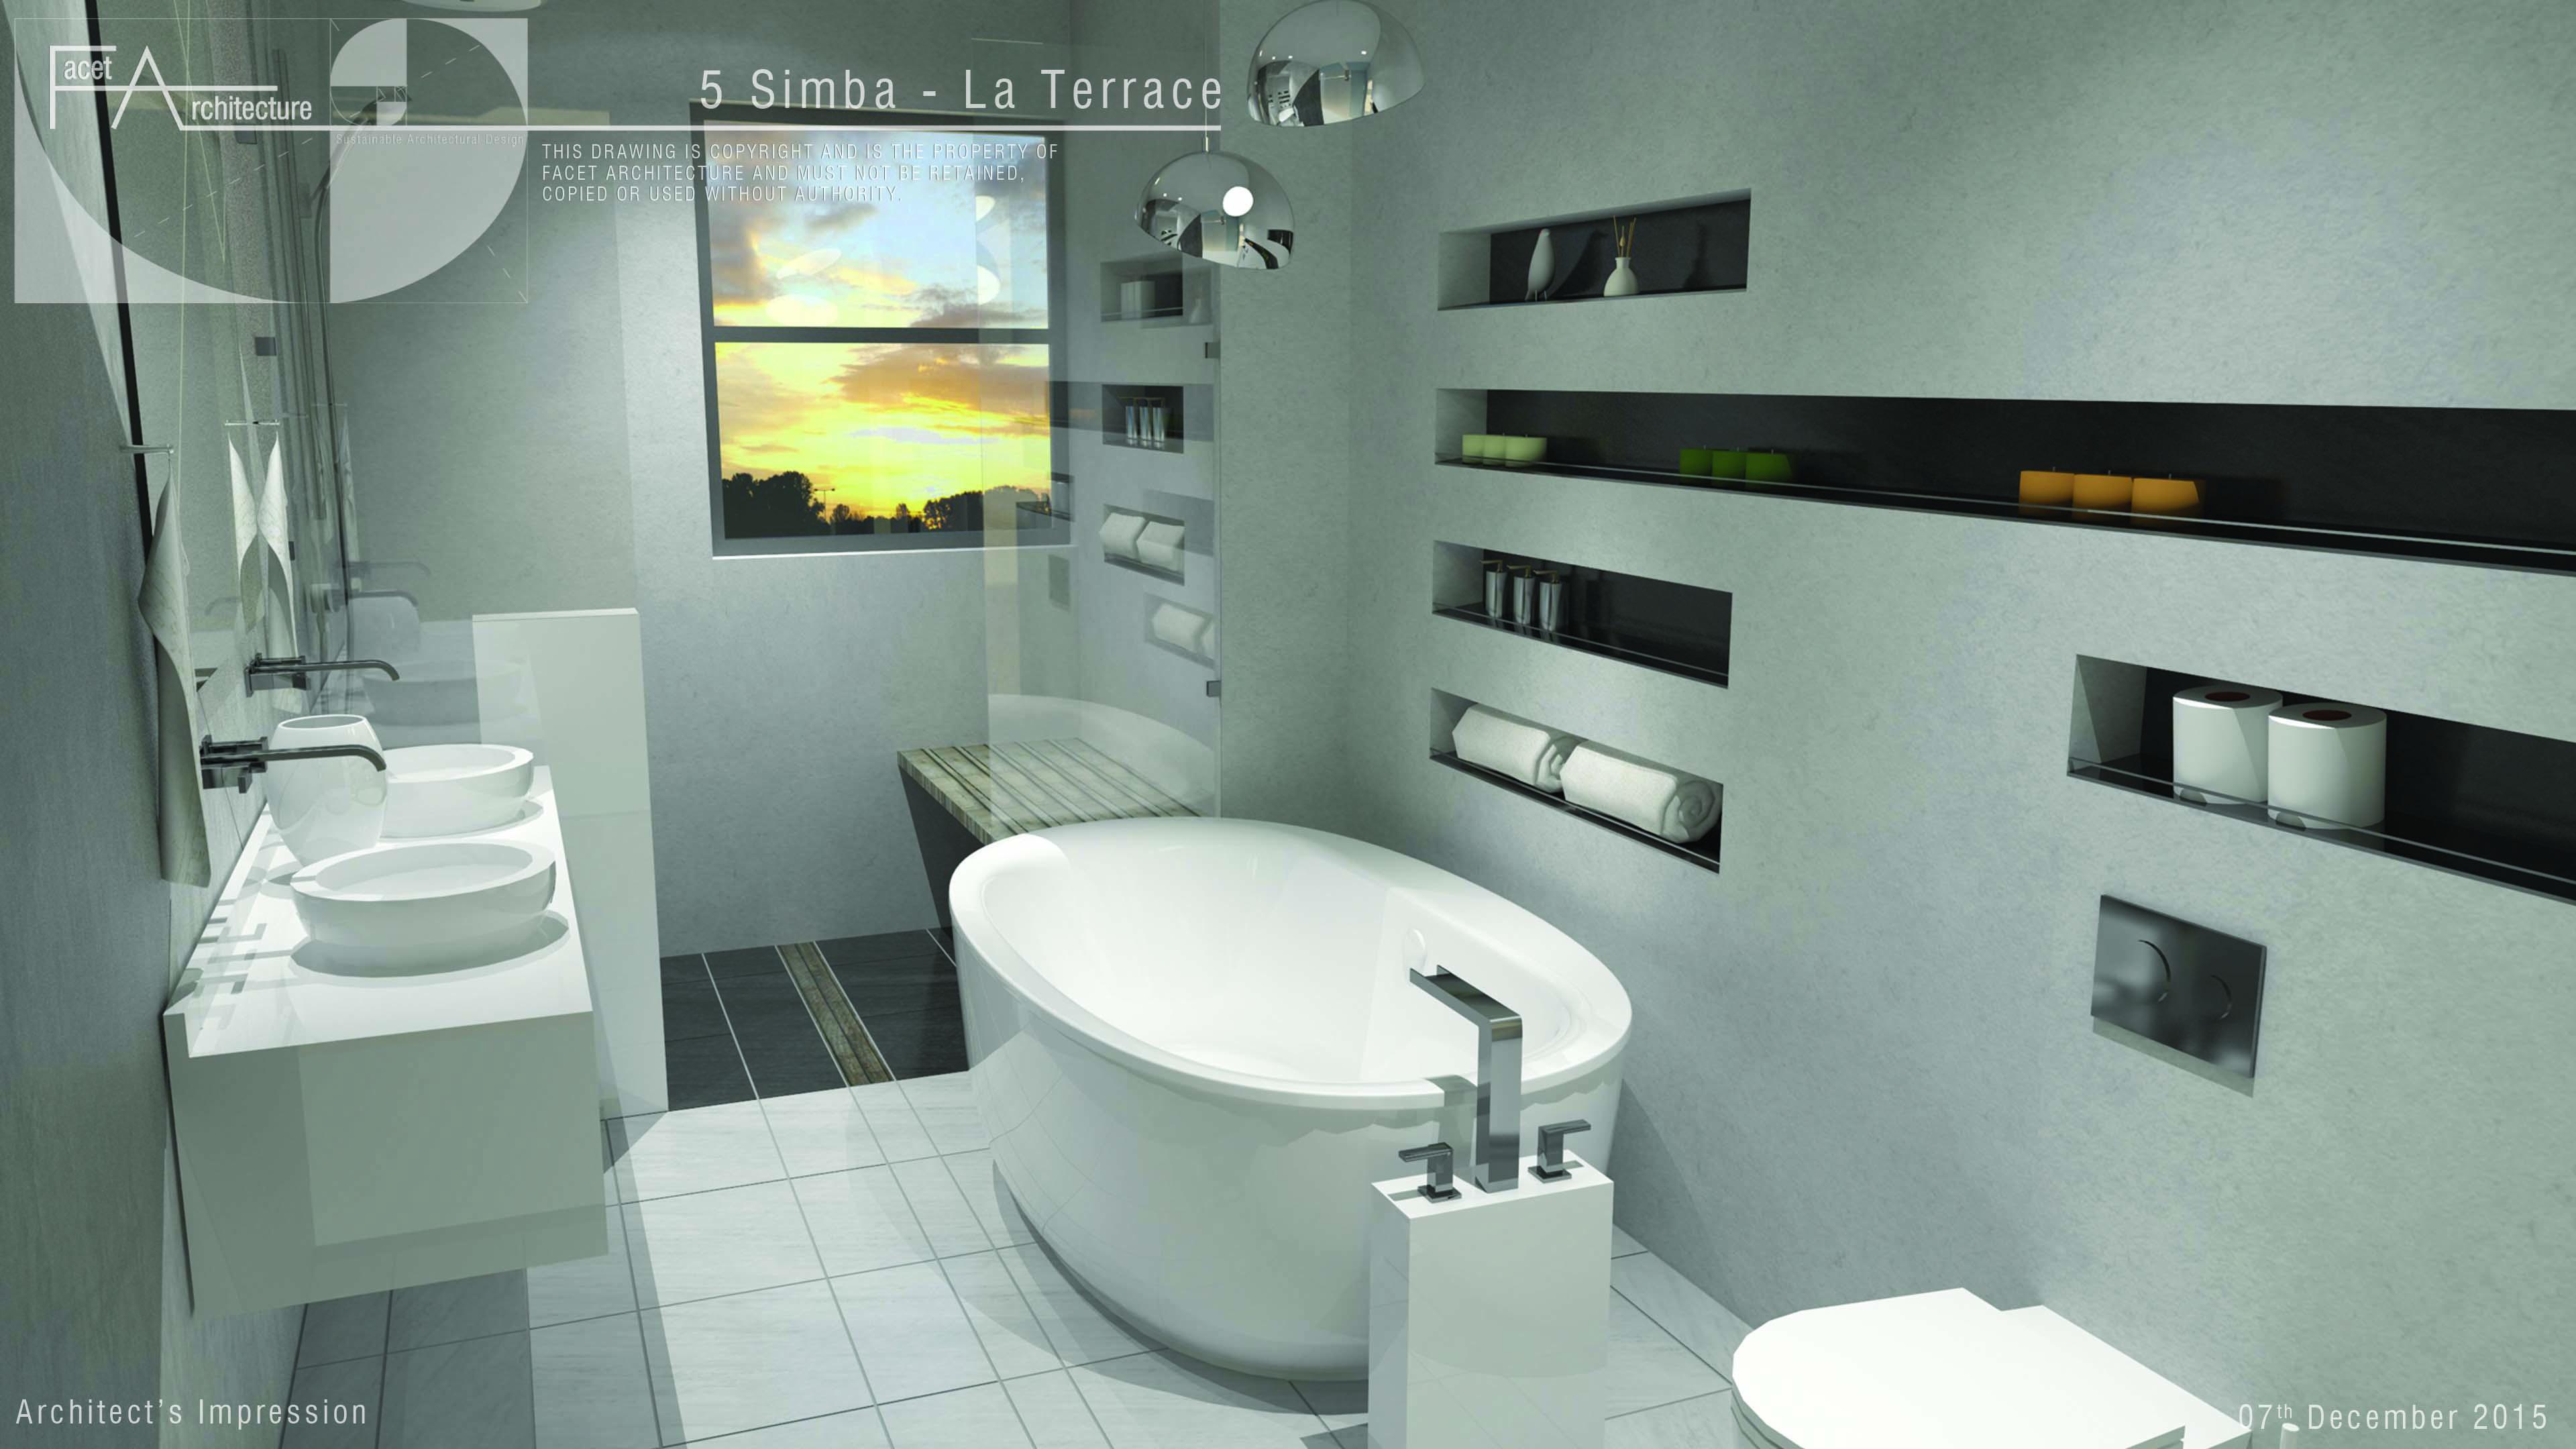 2015-12-07 FA12-02 5 Simba (Internal Render - Bathroom 1)